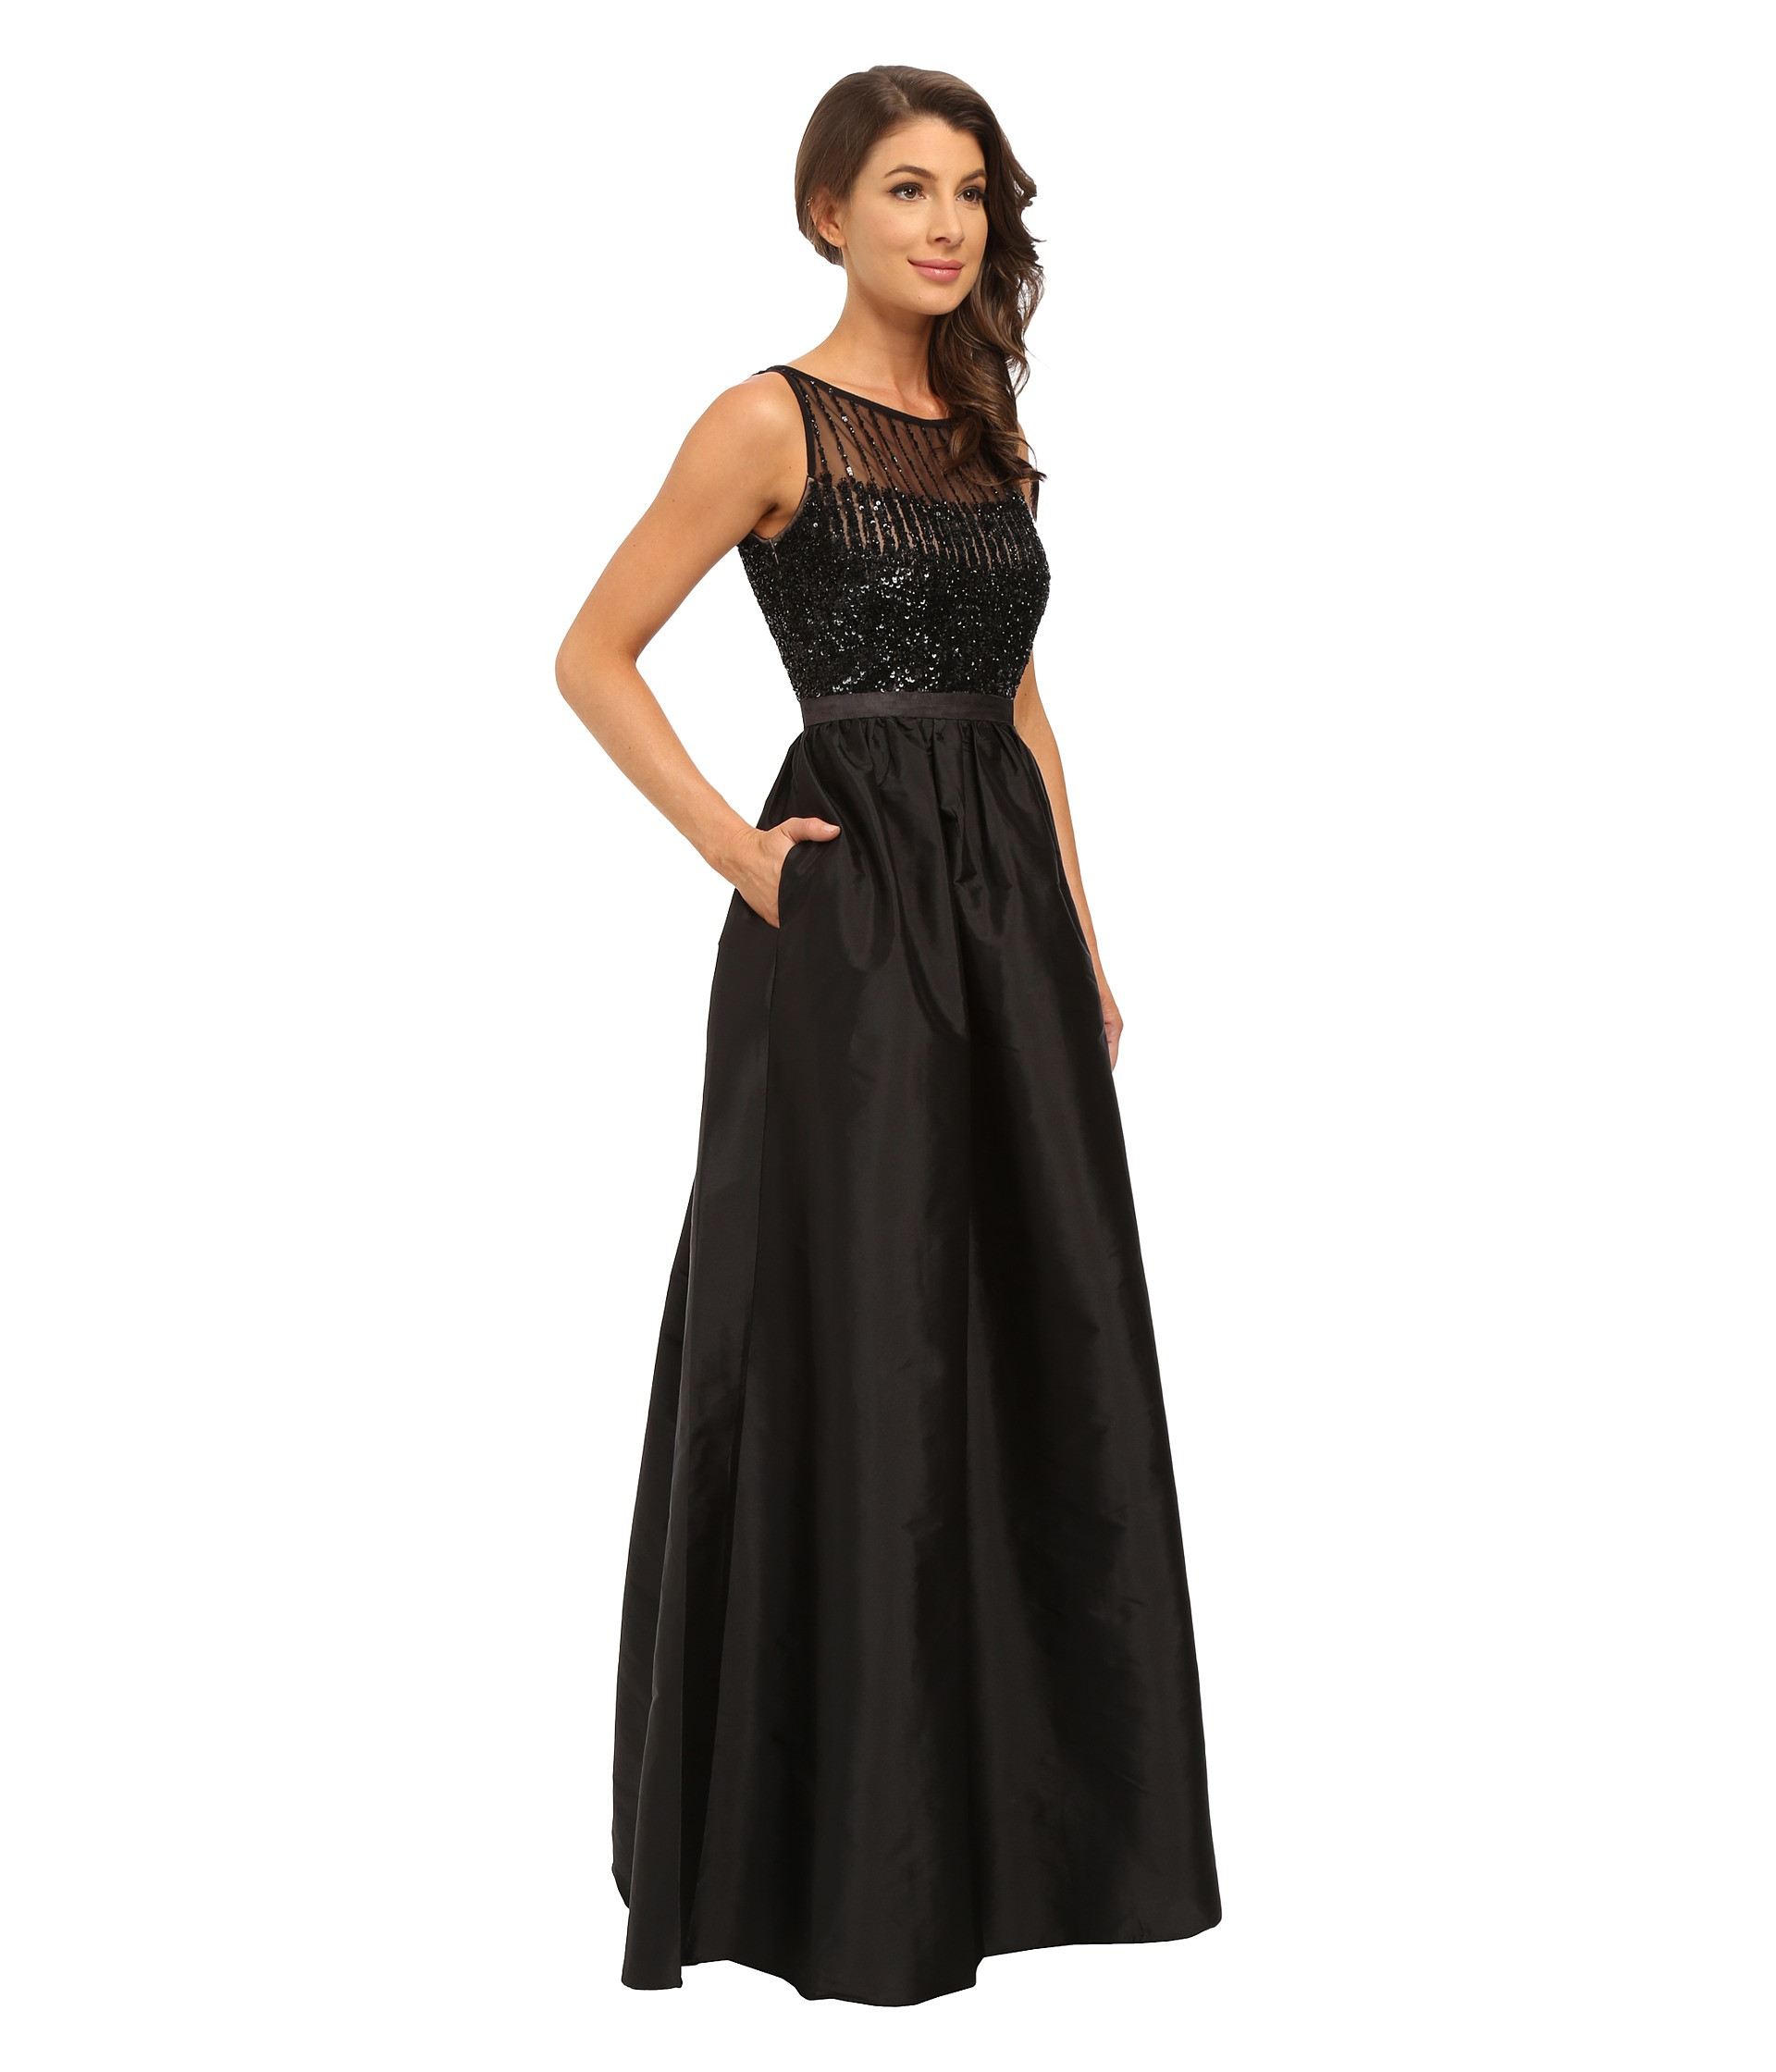 Lyst - Adrianna Papell Sleeveless Beaded Bodice Taffeta Ball Gown in ...